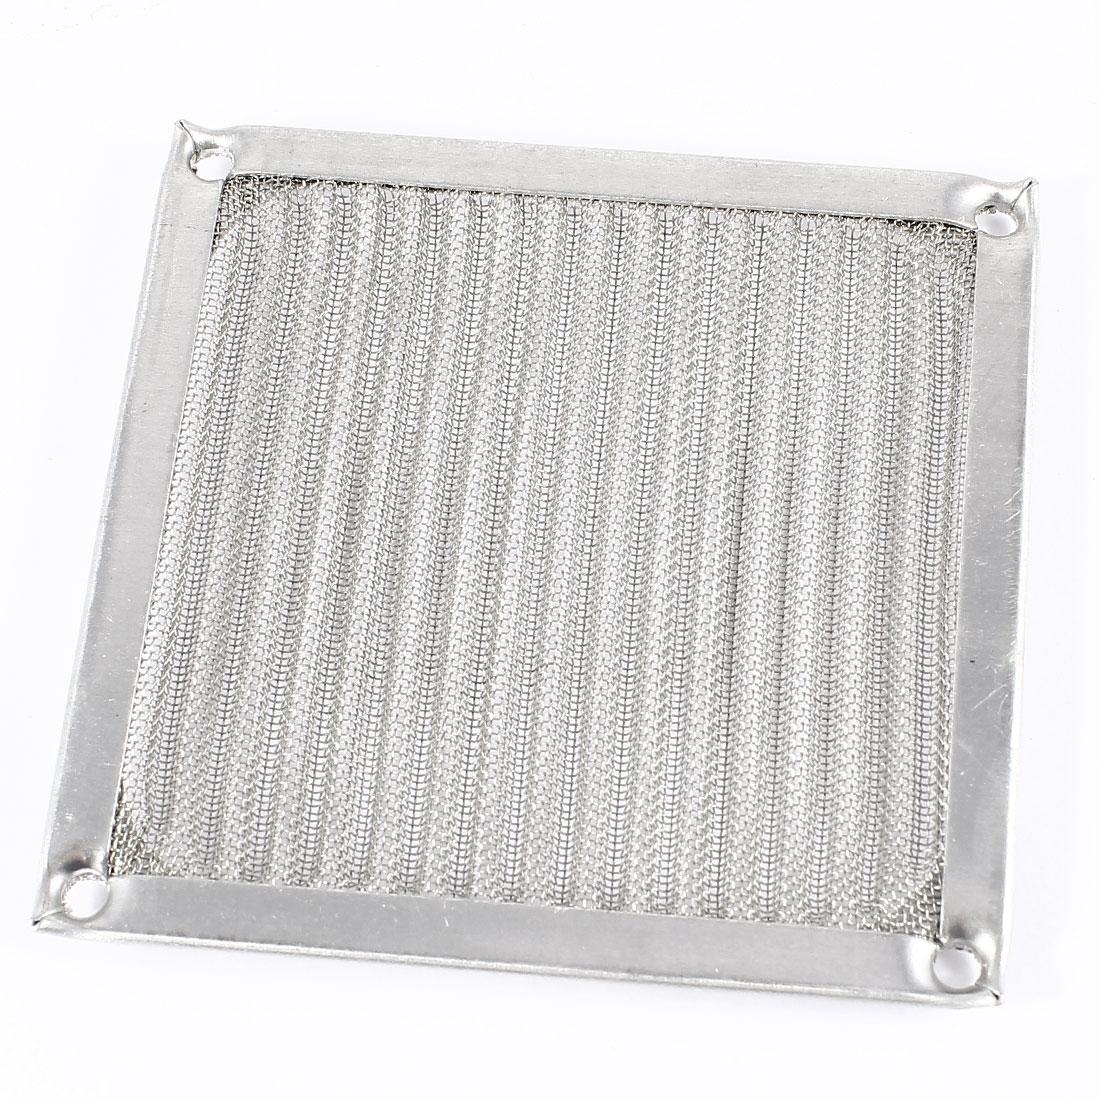 Aluminum Dustproof Filter 90mm PC Computer Case Cooler Fan Dust Guard Mesh